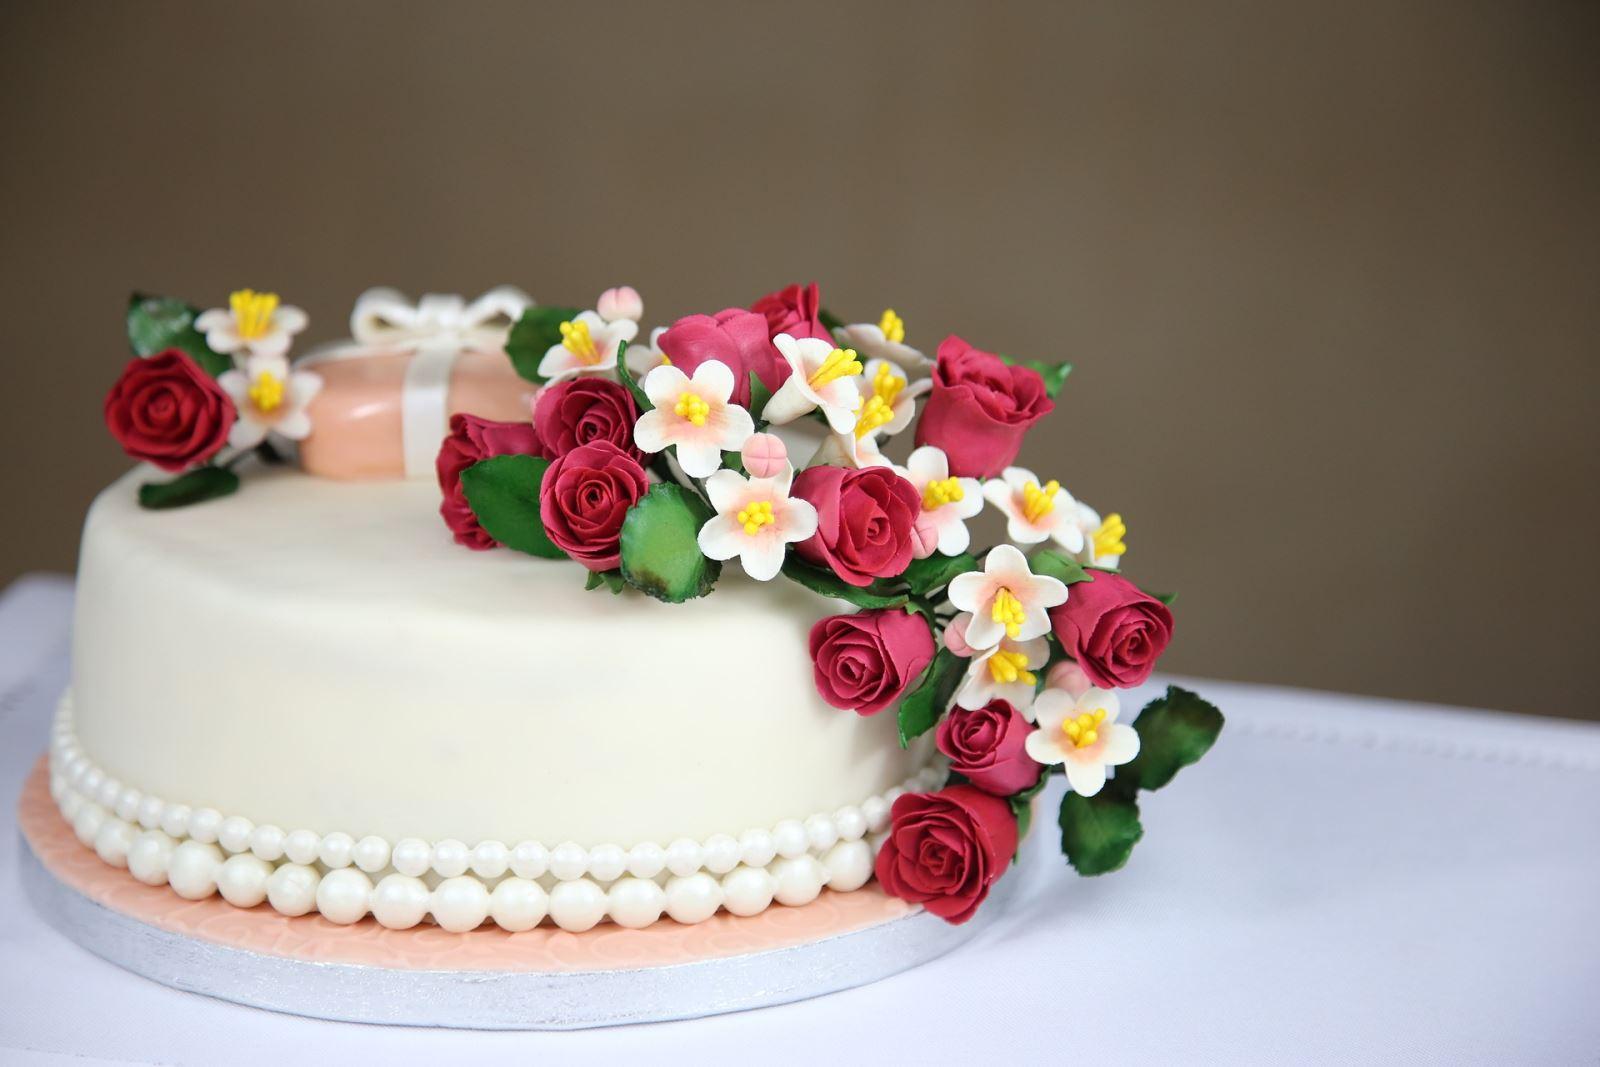 Sugarpaste covered cake